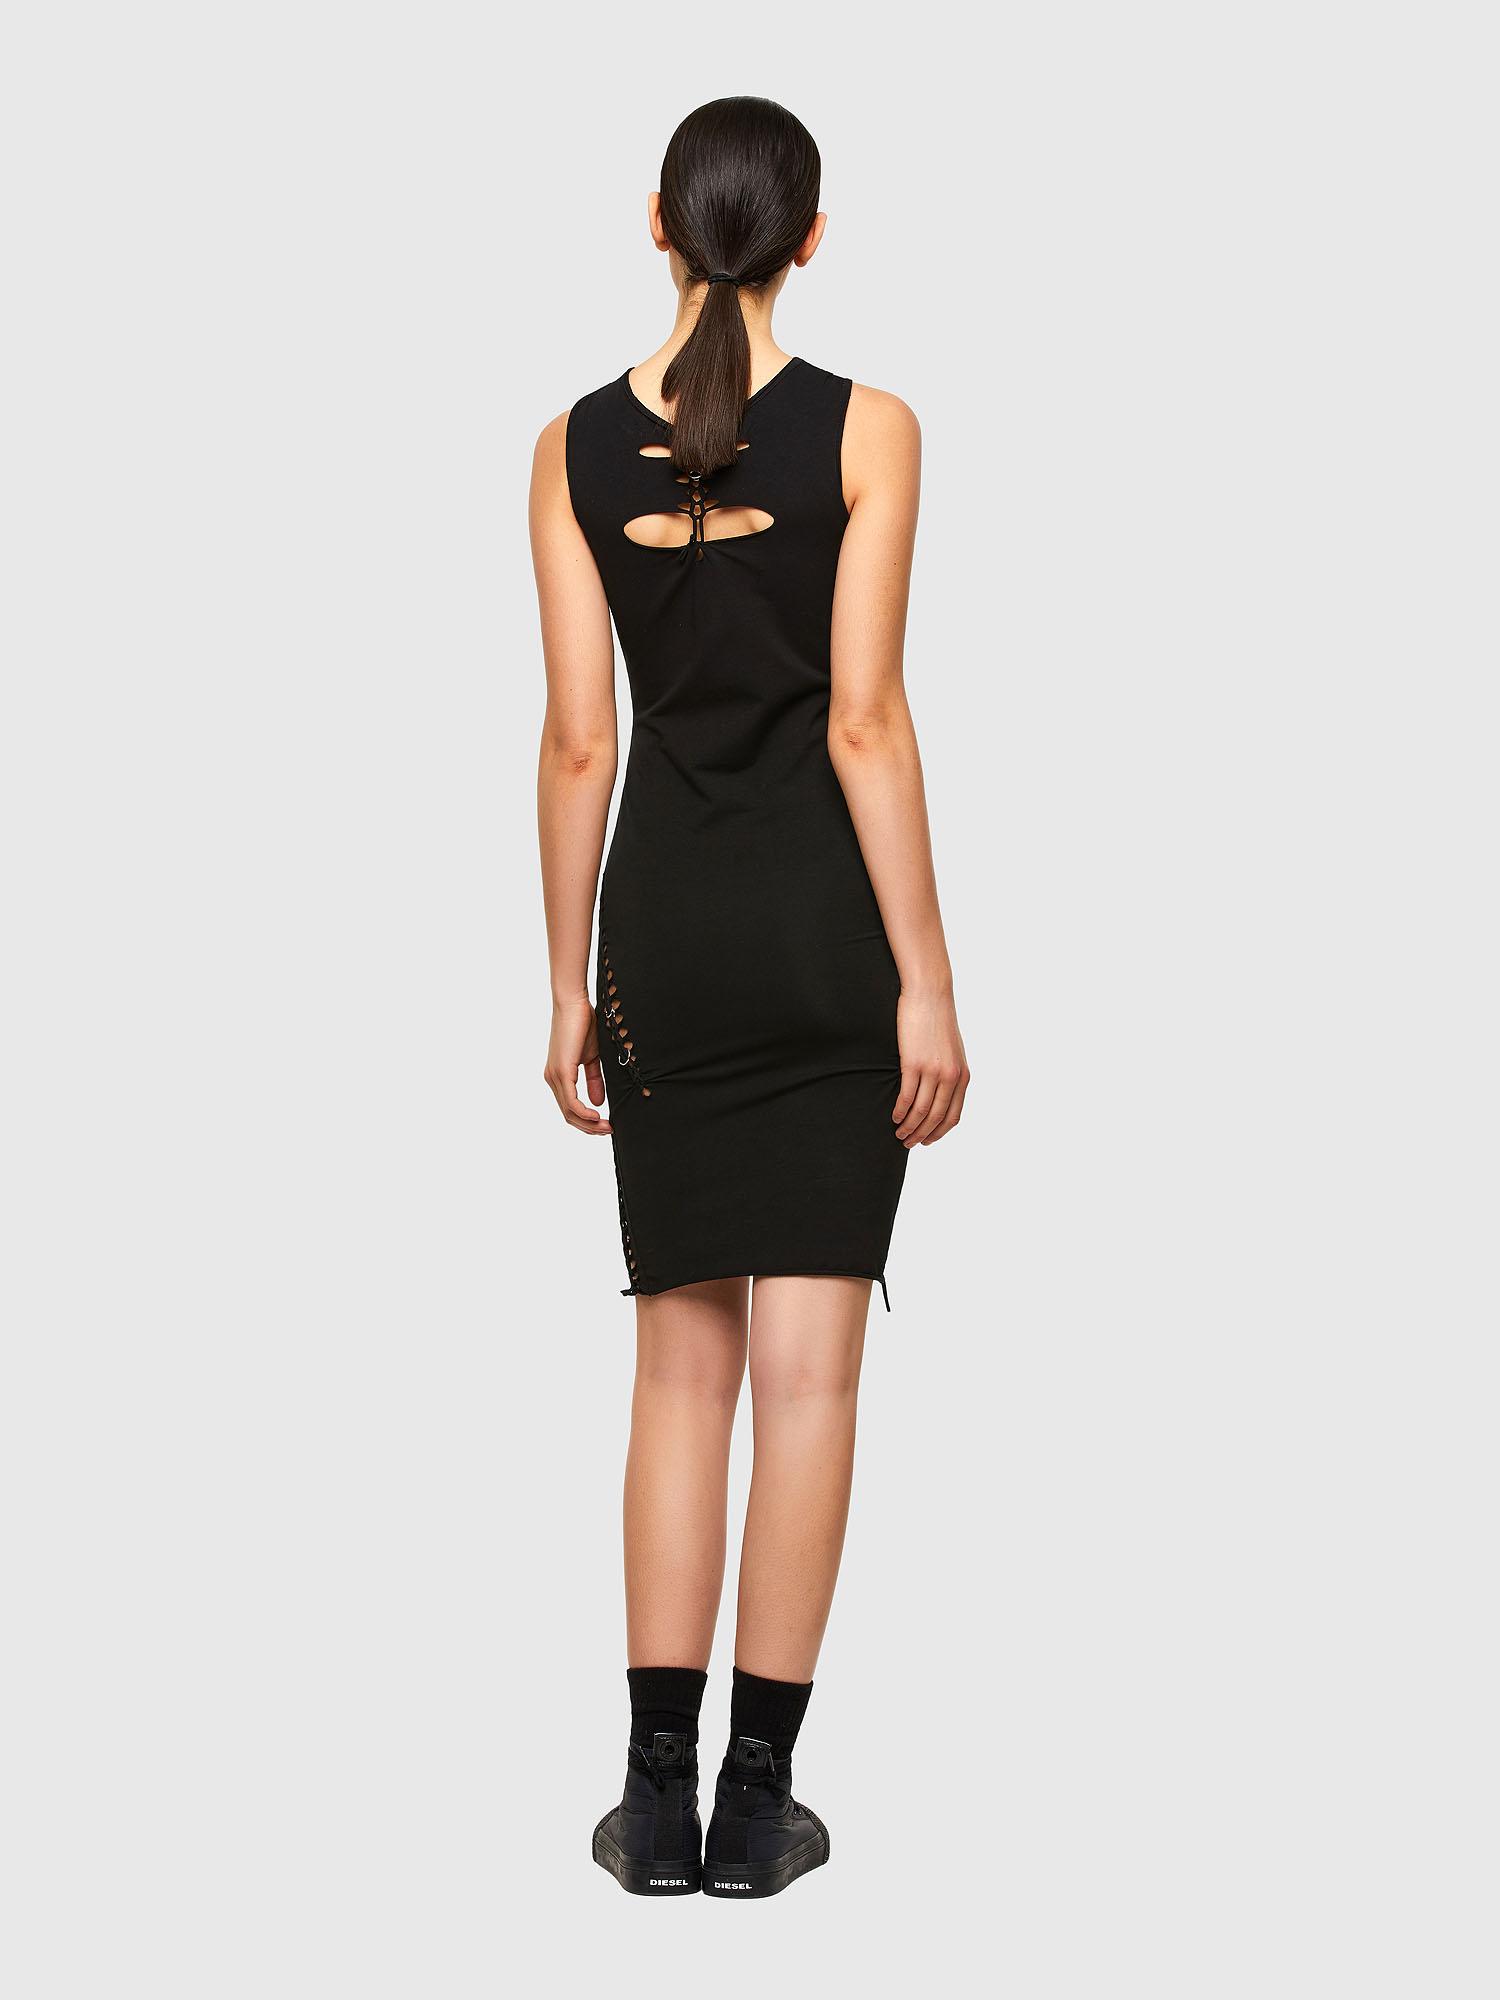 Diesel - D-BRAIDEN, Black - Dresses - Image 2